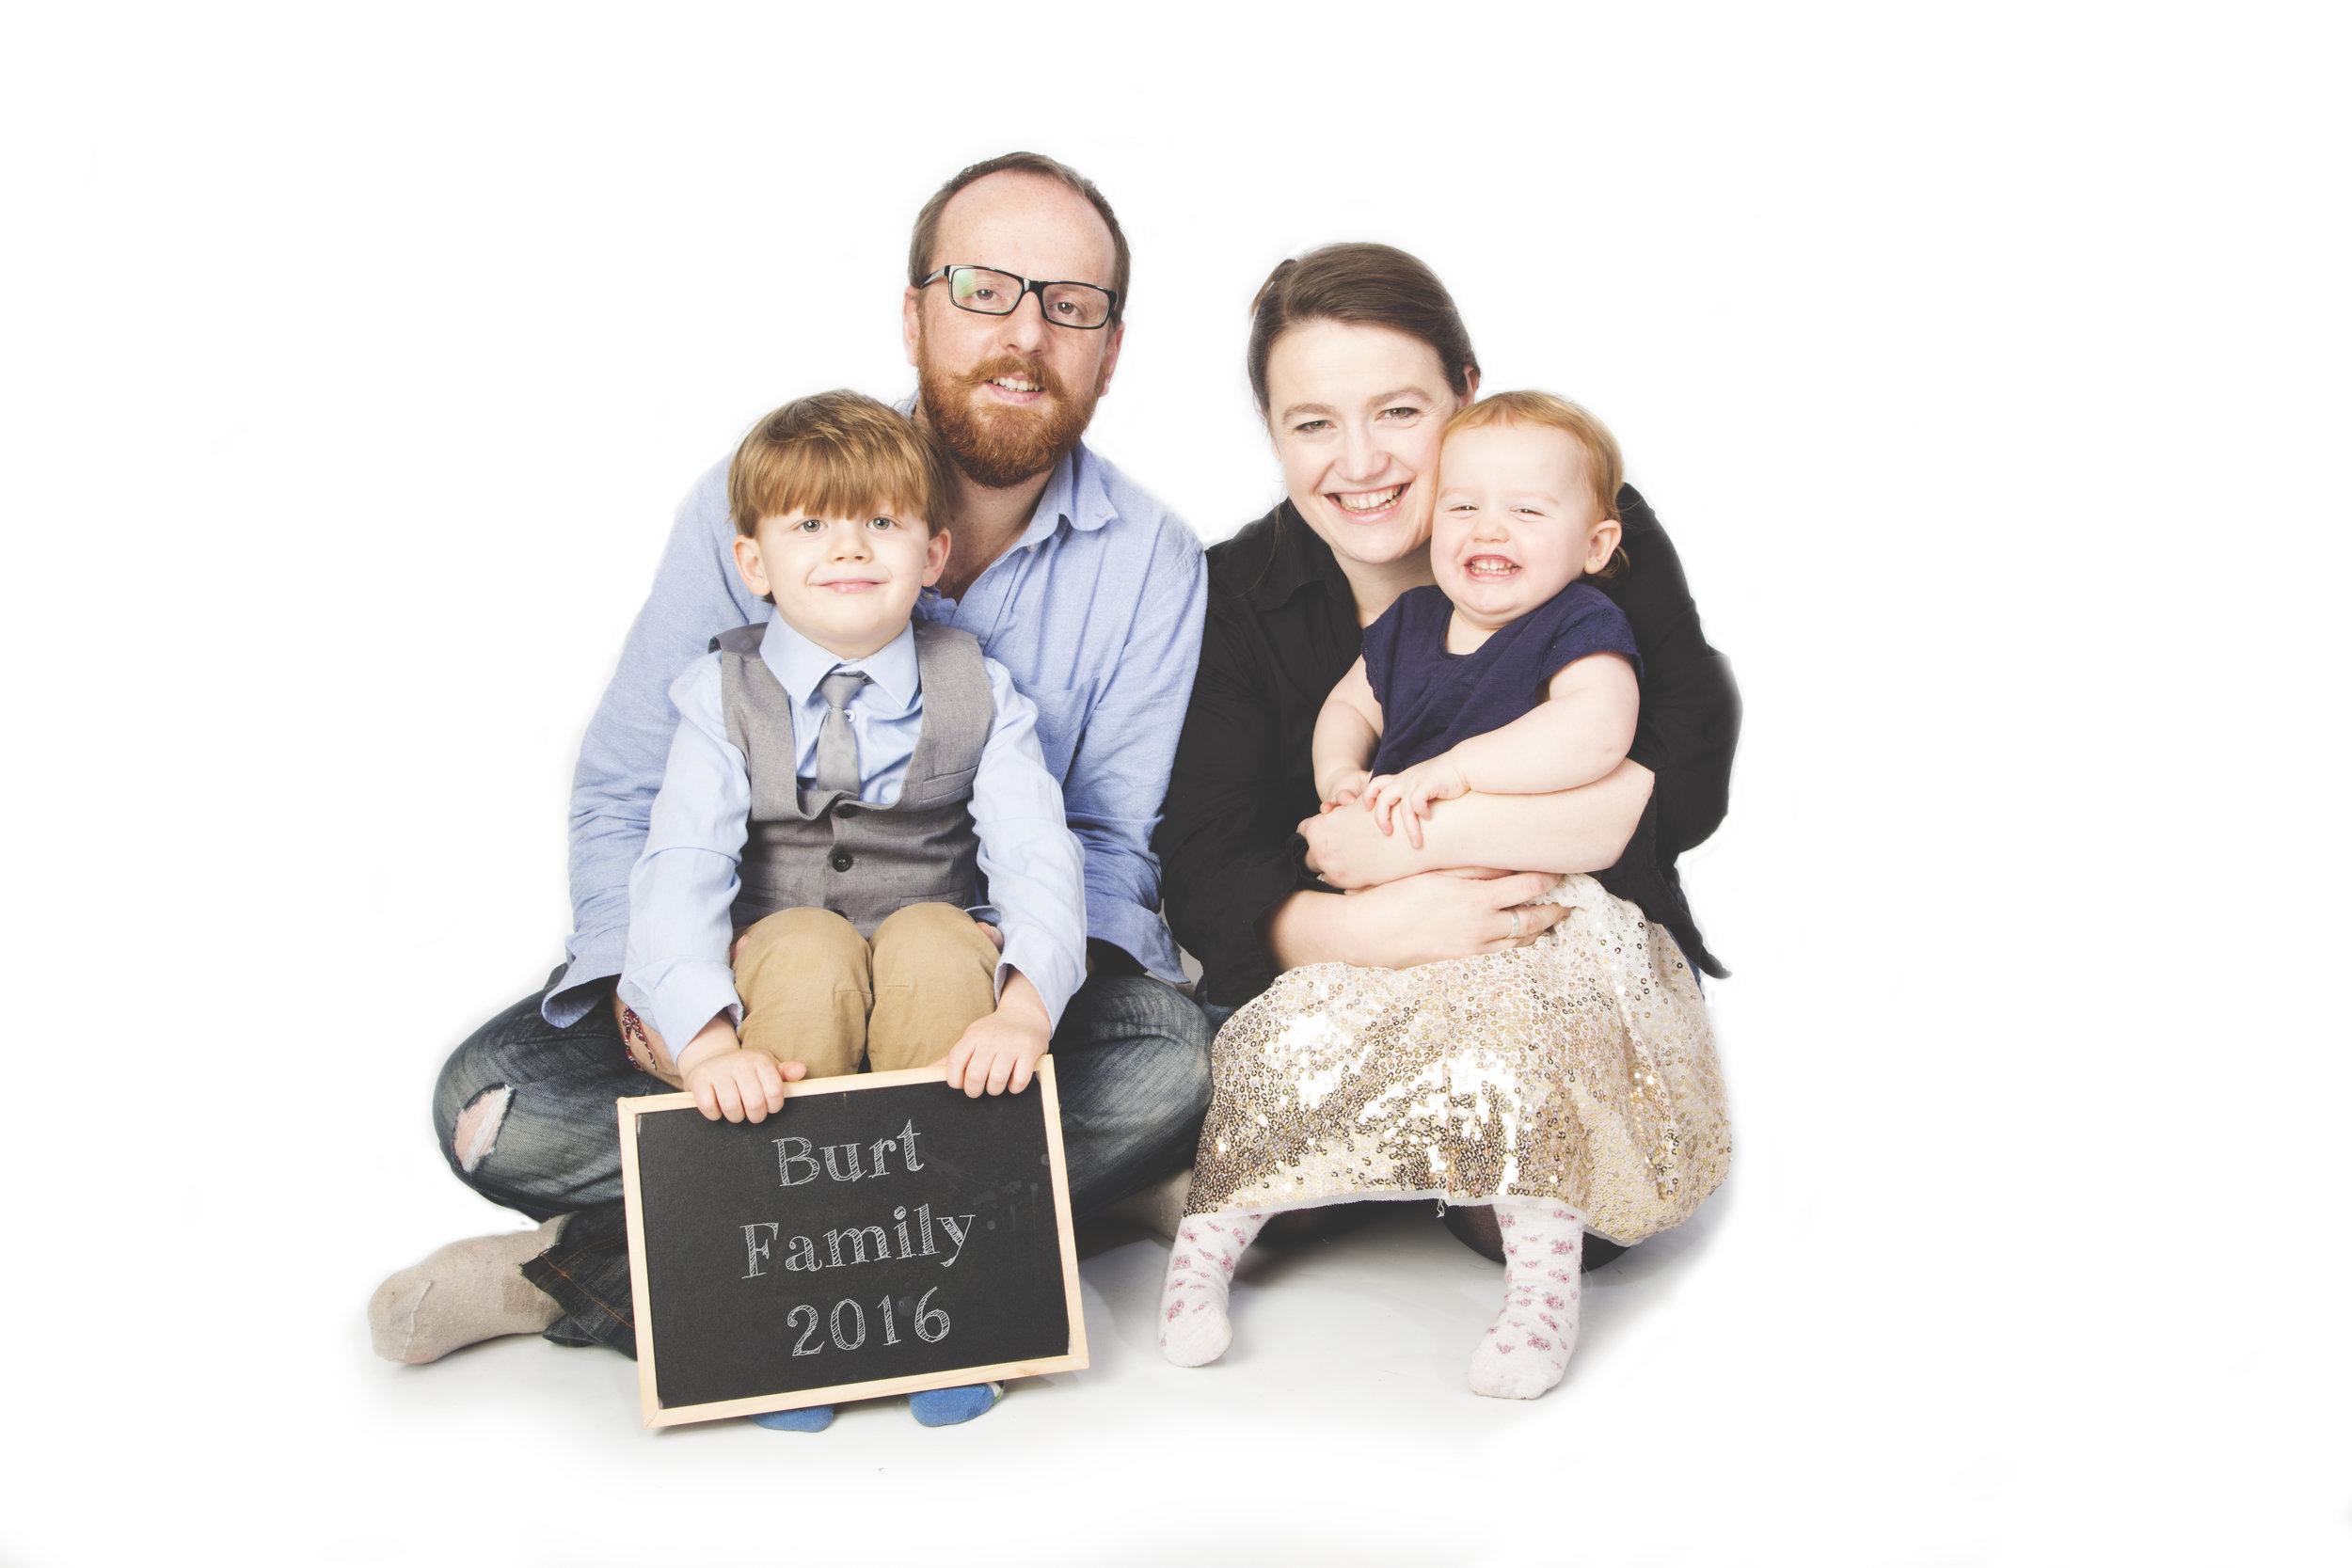 27burt family.jpg